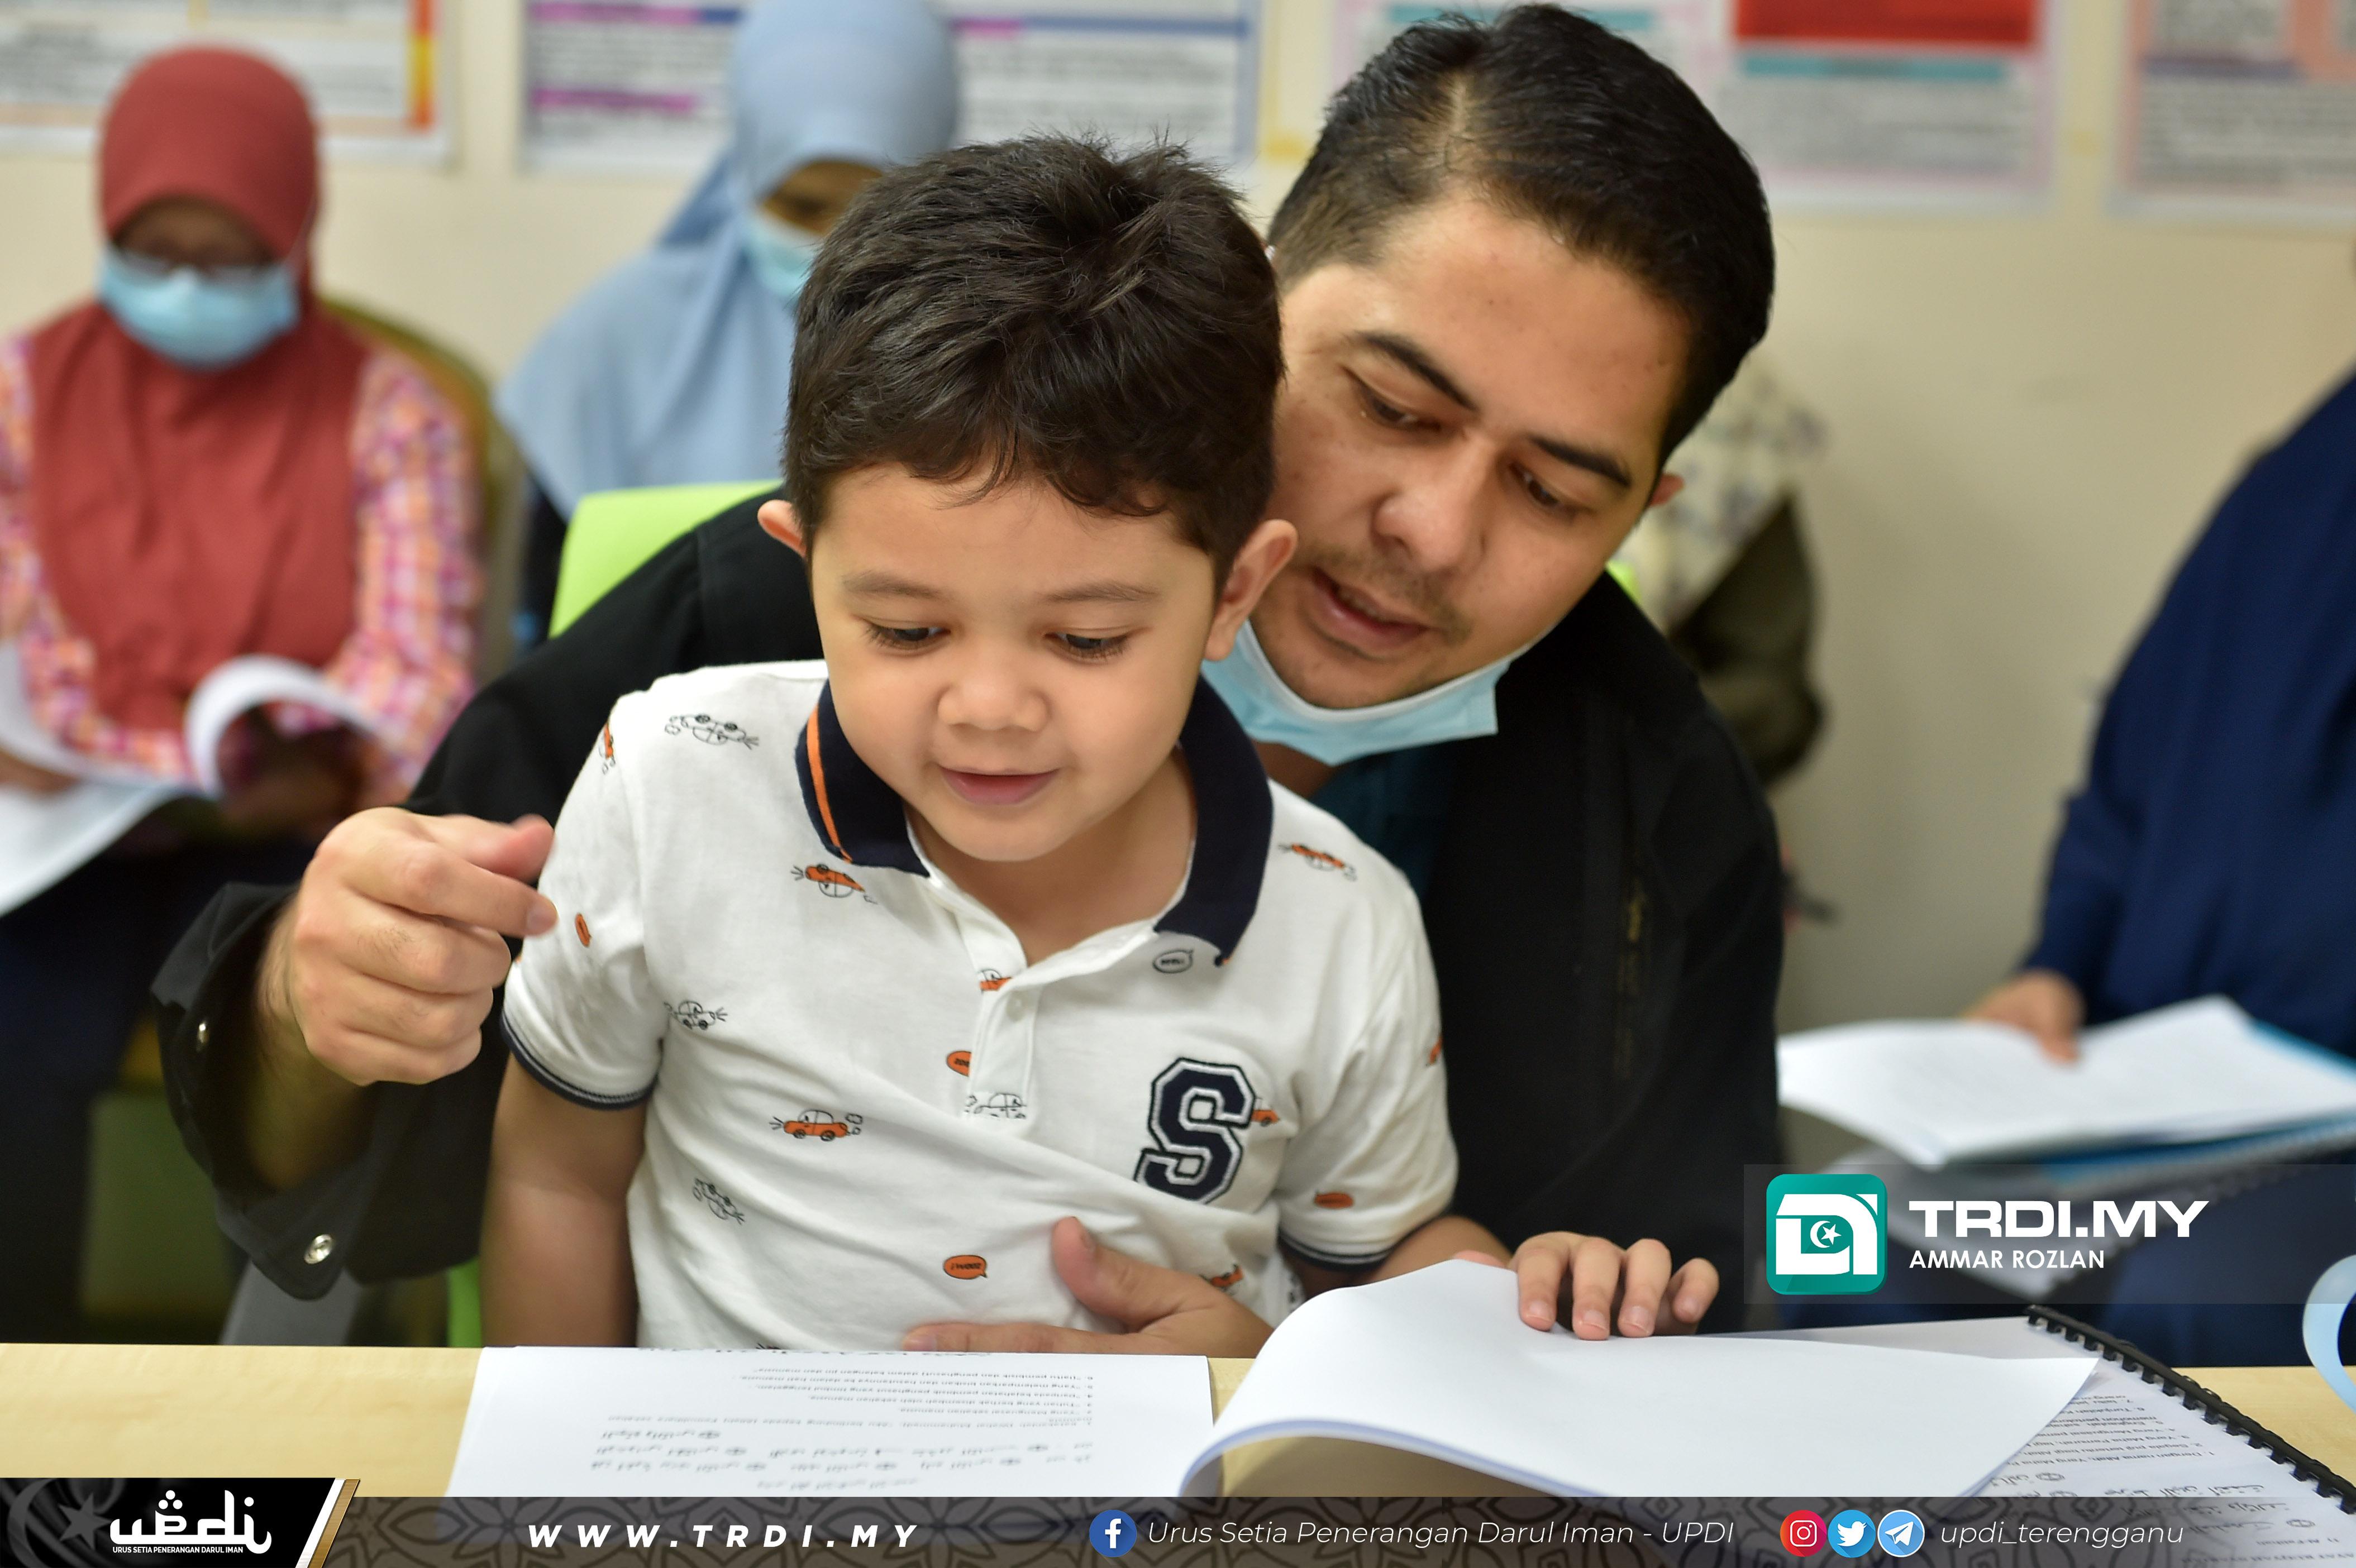 Program Perasmian Quranic Playgroup Austisme untuk anak-anak OKU (Bajet Kerajaan Negeri) di Unisza